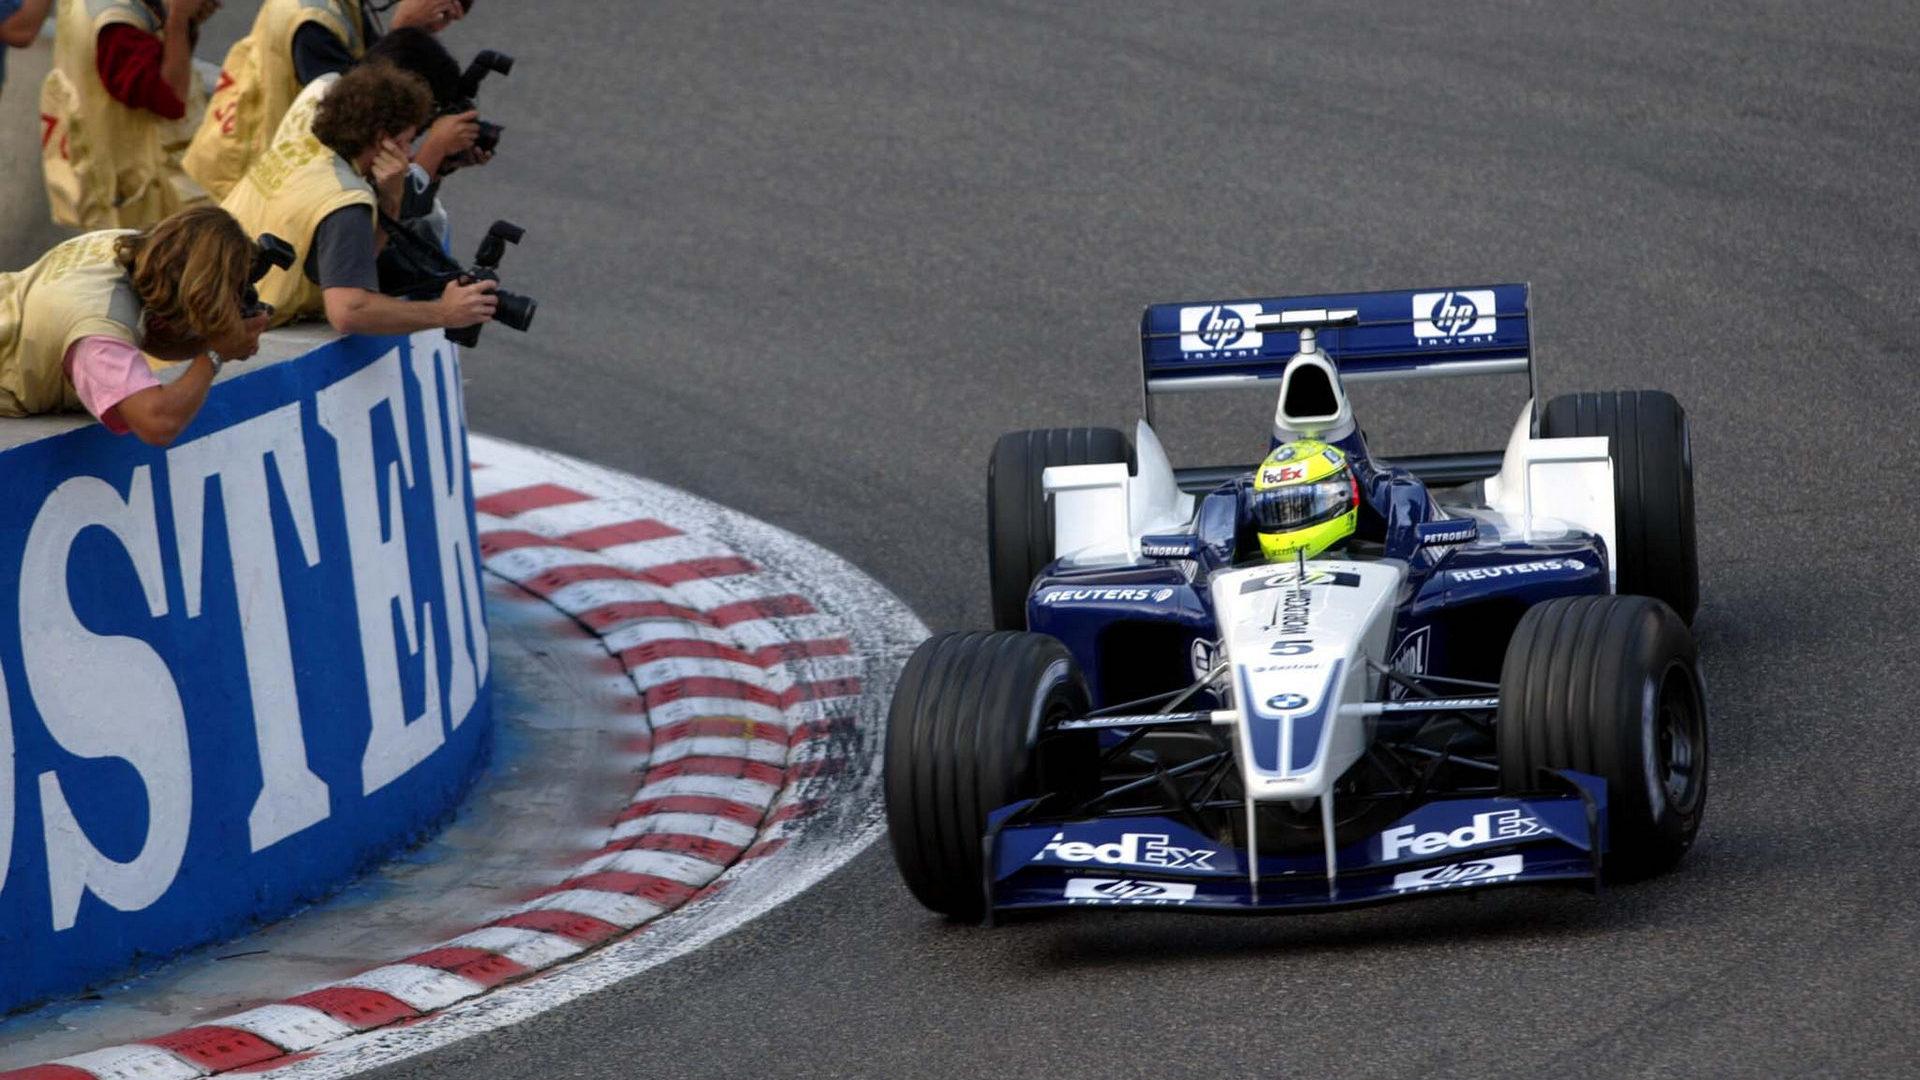 HD Wallpapers 2002 Formula 1 Grand Prix of Belgium  F1